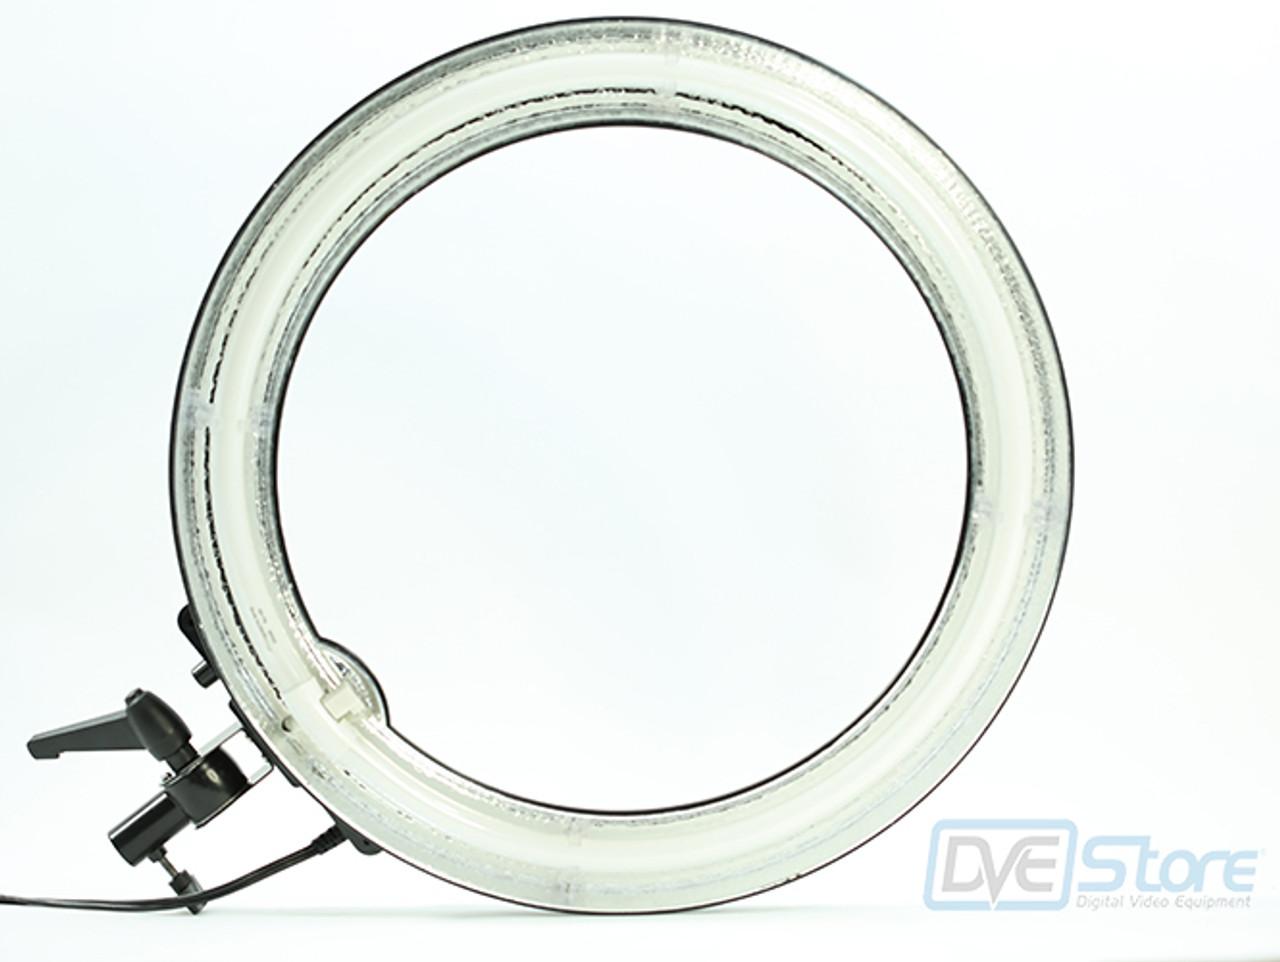 18in Ring Light with Dimmer by Stellar  sc 1 st  DVEStore & Stellar 18